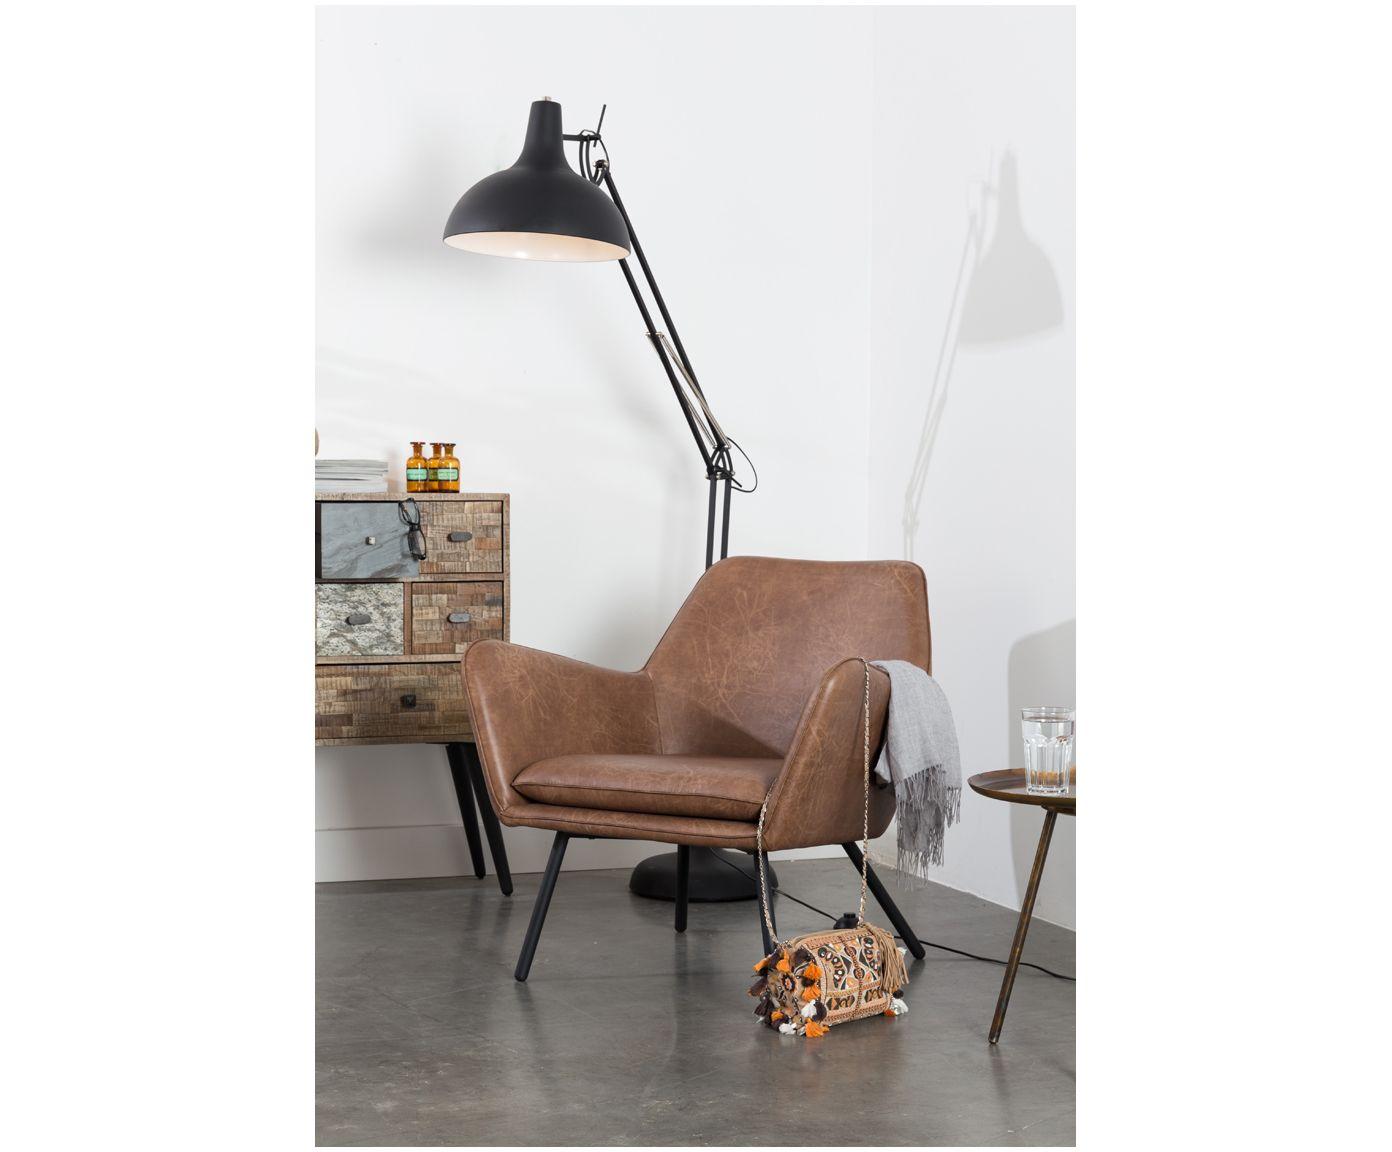 Kunstleder Sessel Bon Im Industrial Design Westwingnow Haus Deko Sessel Stühle